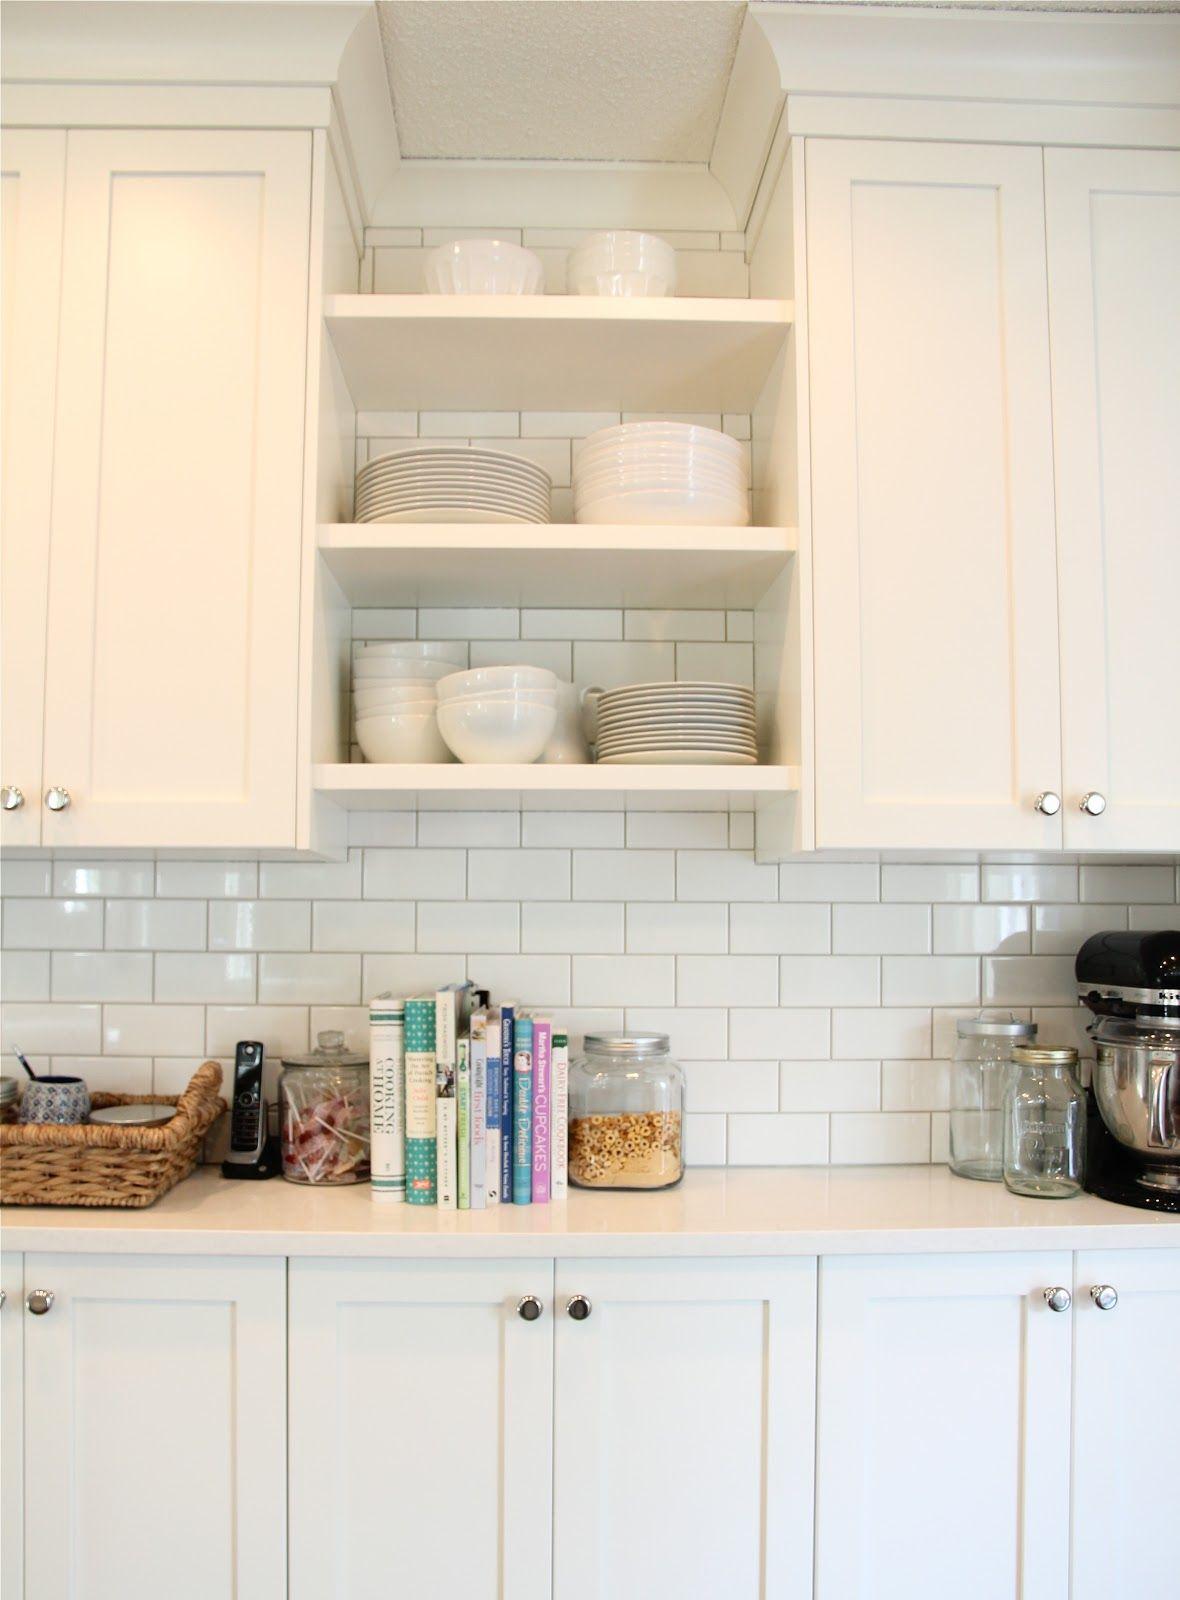 open kitchen cabinets decoration cloud white light gray grout subway tiles